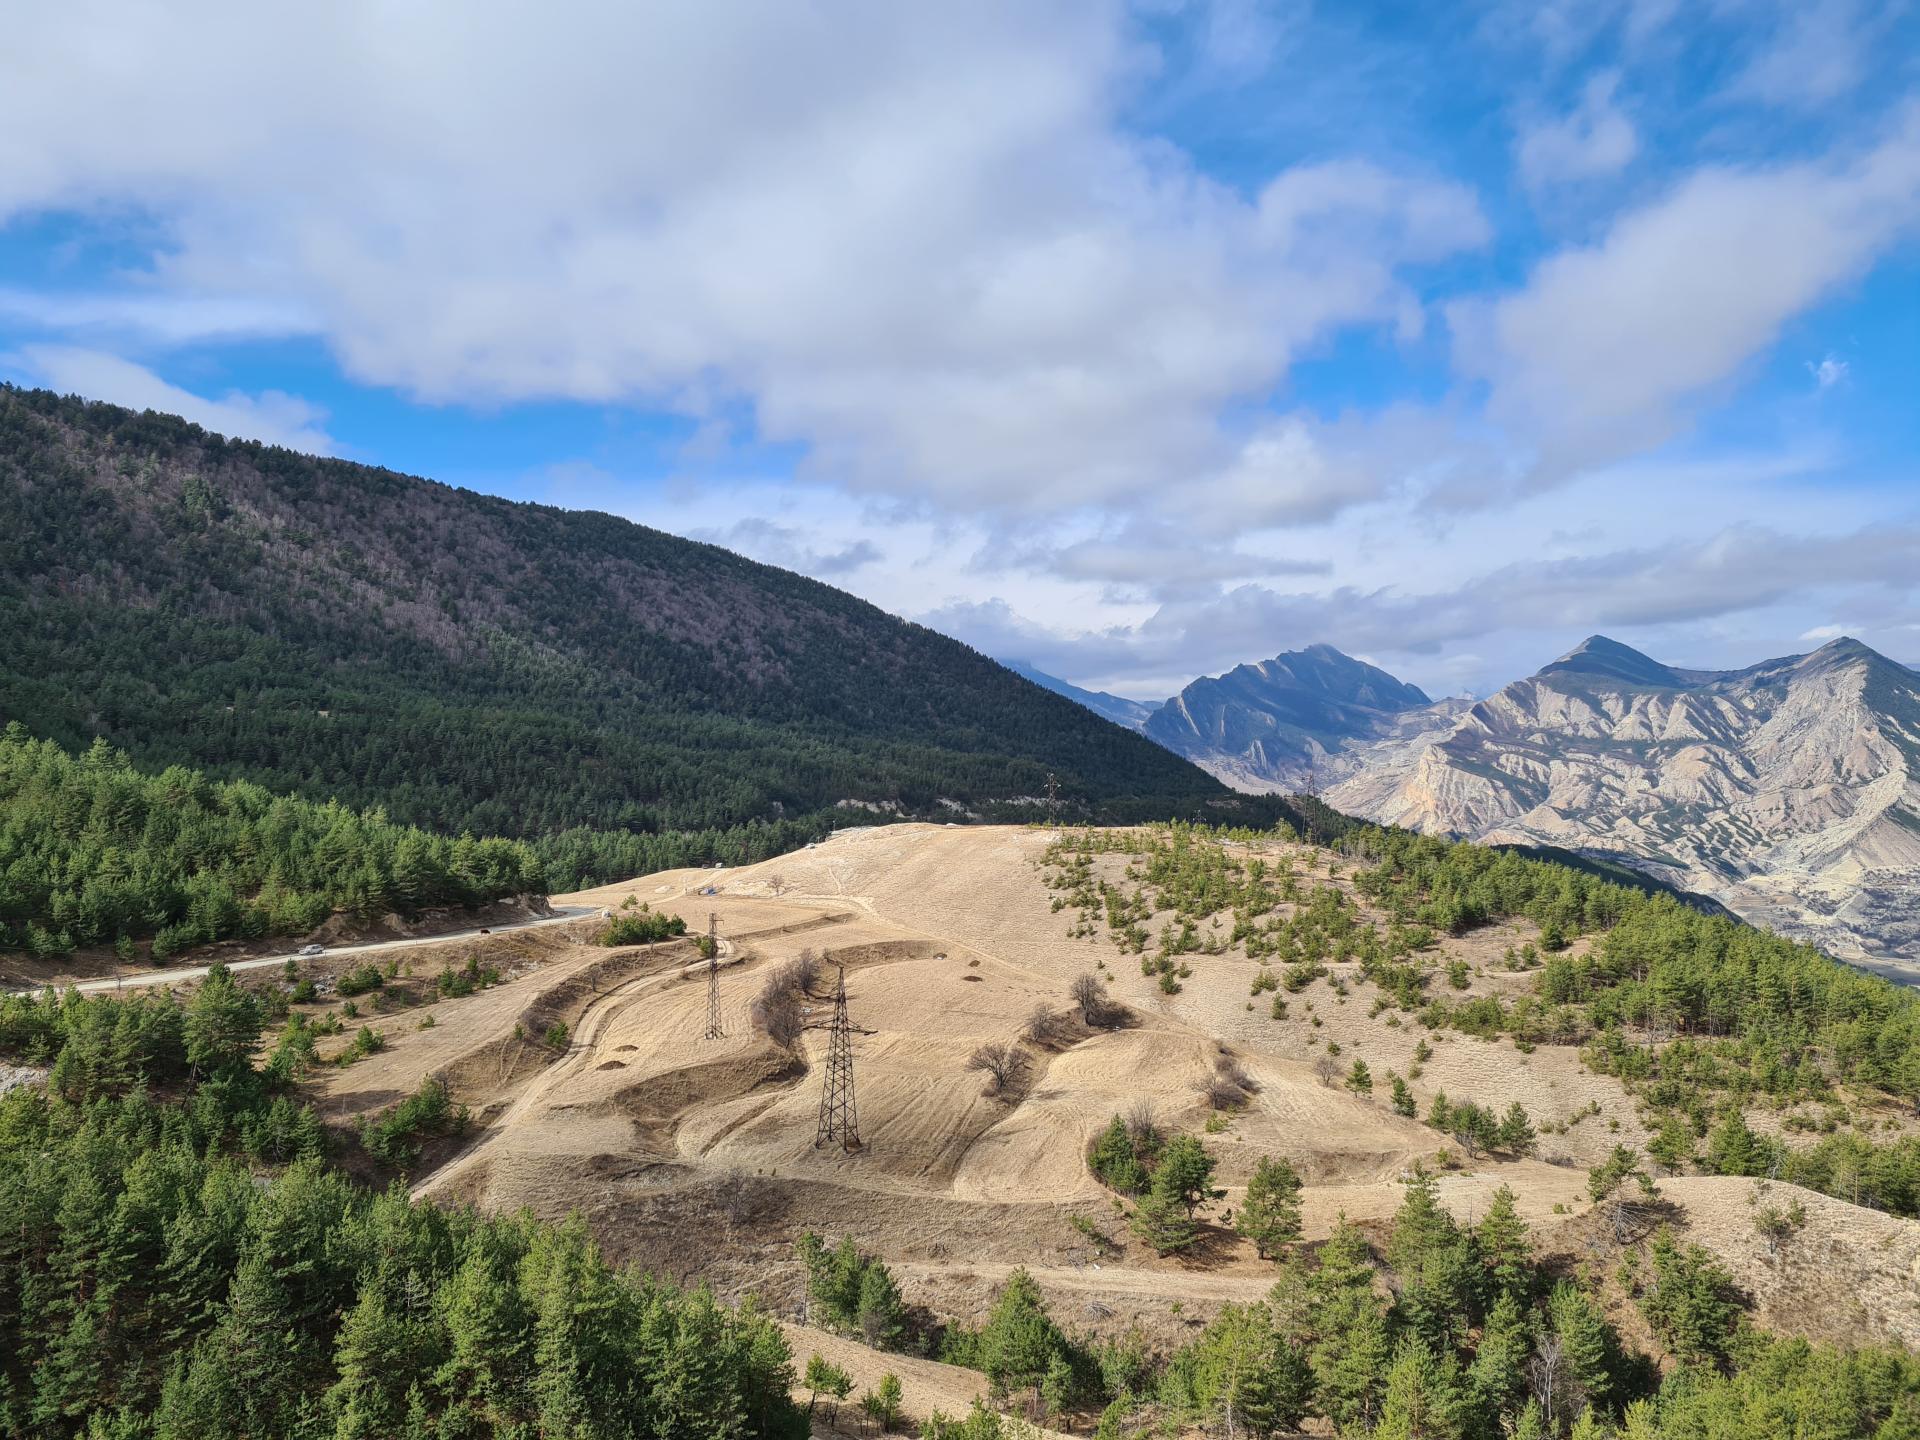 хвойный лес на горах в Дагестане